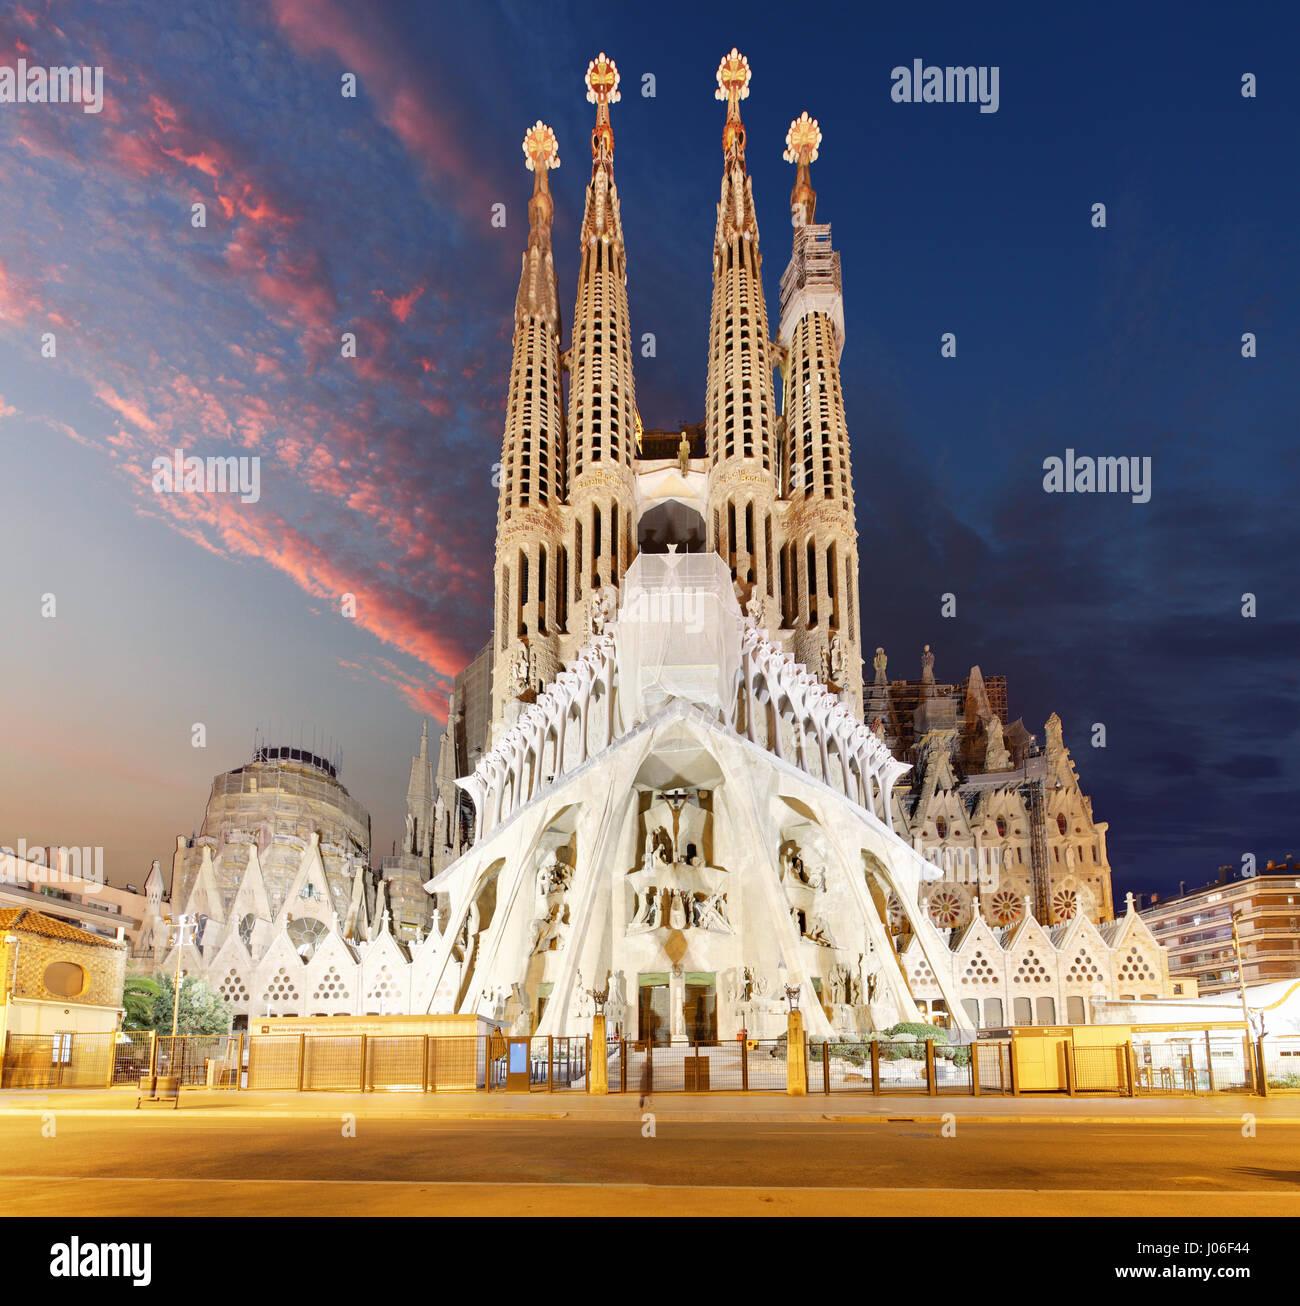 BARCELONA, SPAIN - FEBRUARY 10, 2016: Sagrada Familia basilica in Barcelona. The Antoni Gaudi masterpiece has become - Stock Image